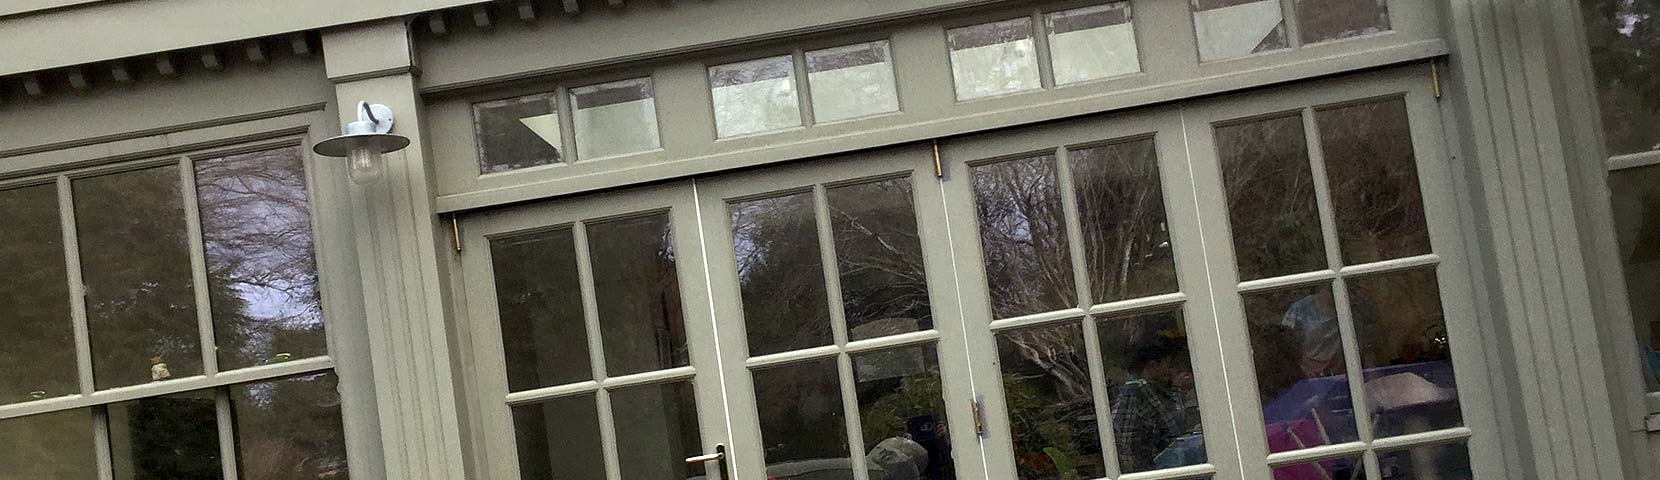 bespoke windows and doors Plymouth